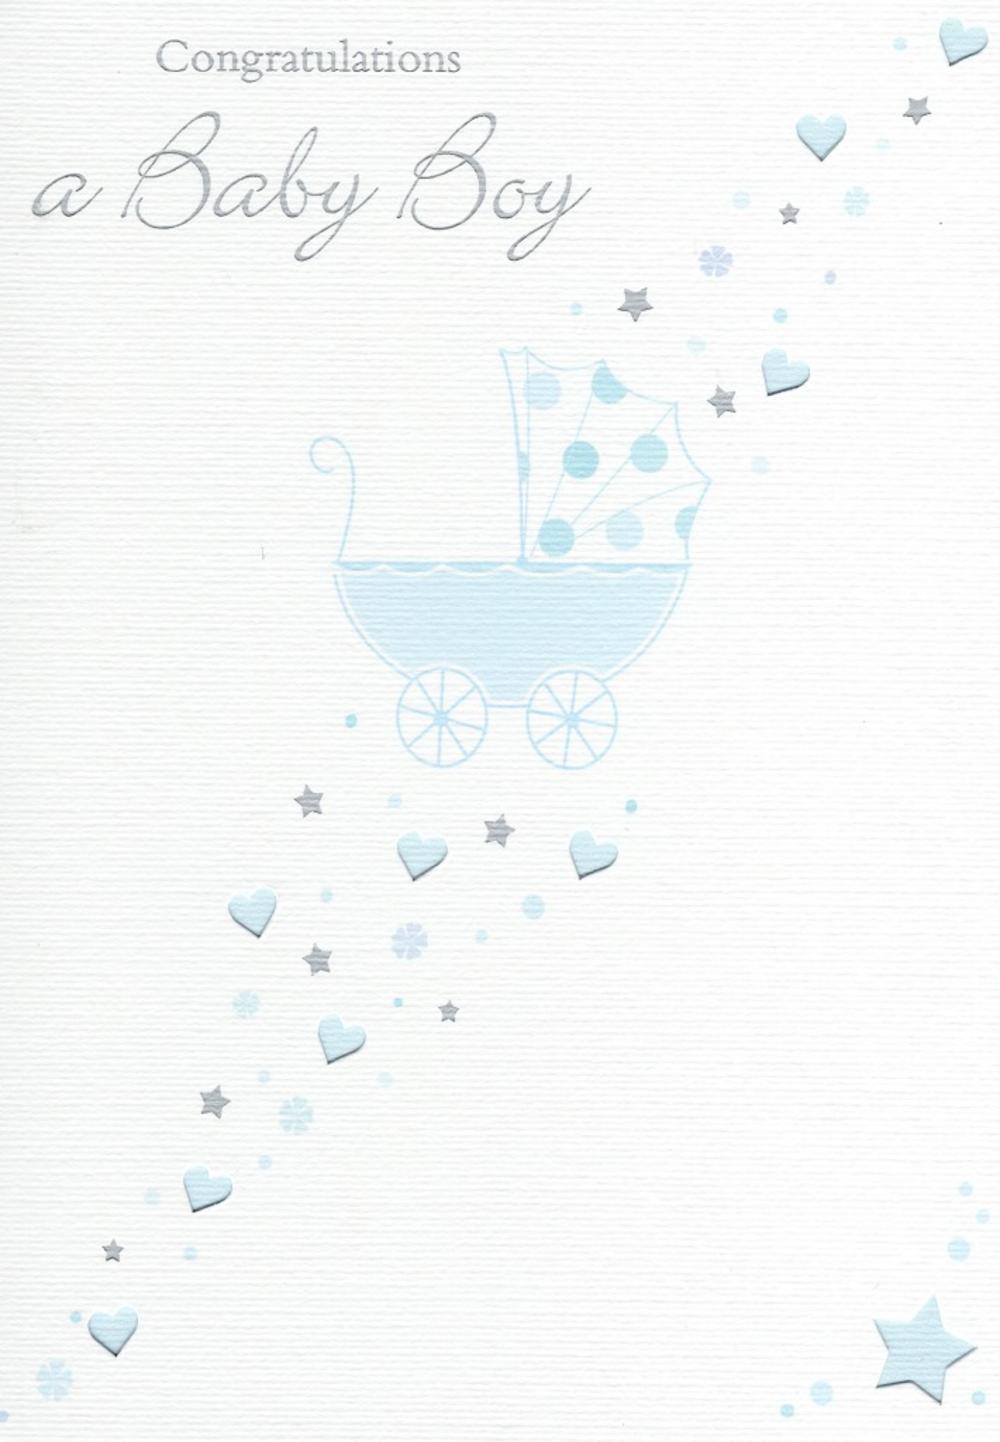 Congratulations A Baby Boy Greeting Card